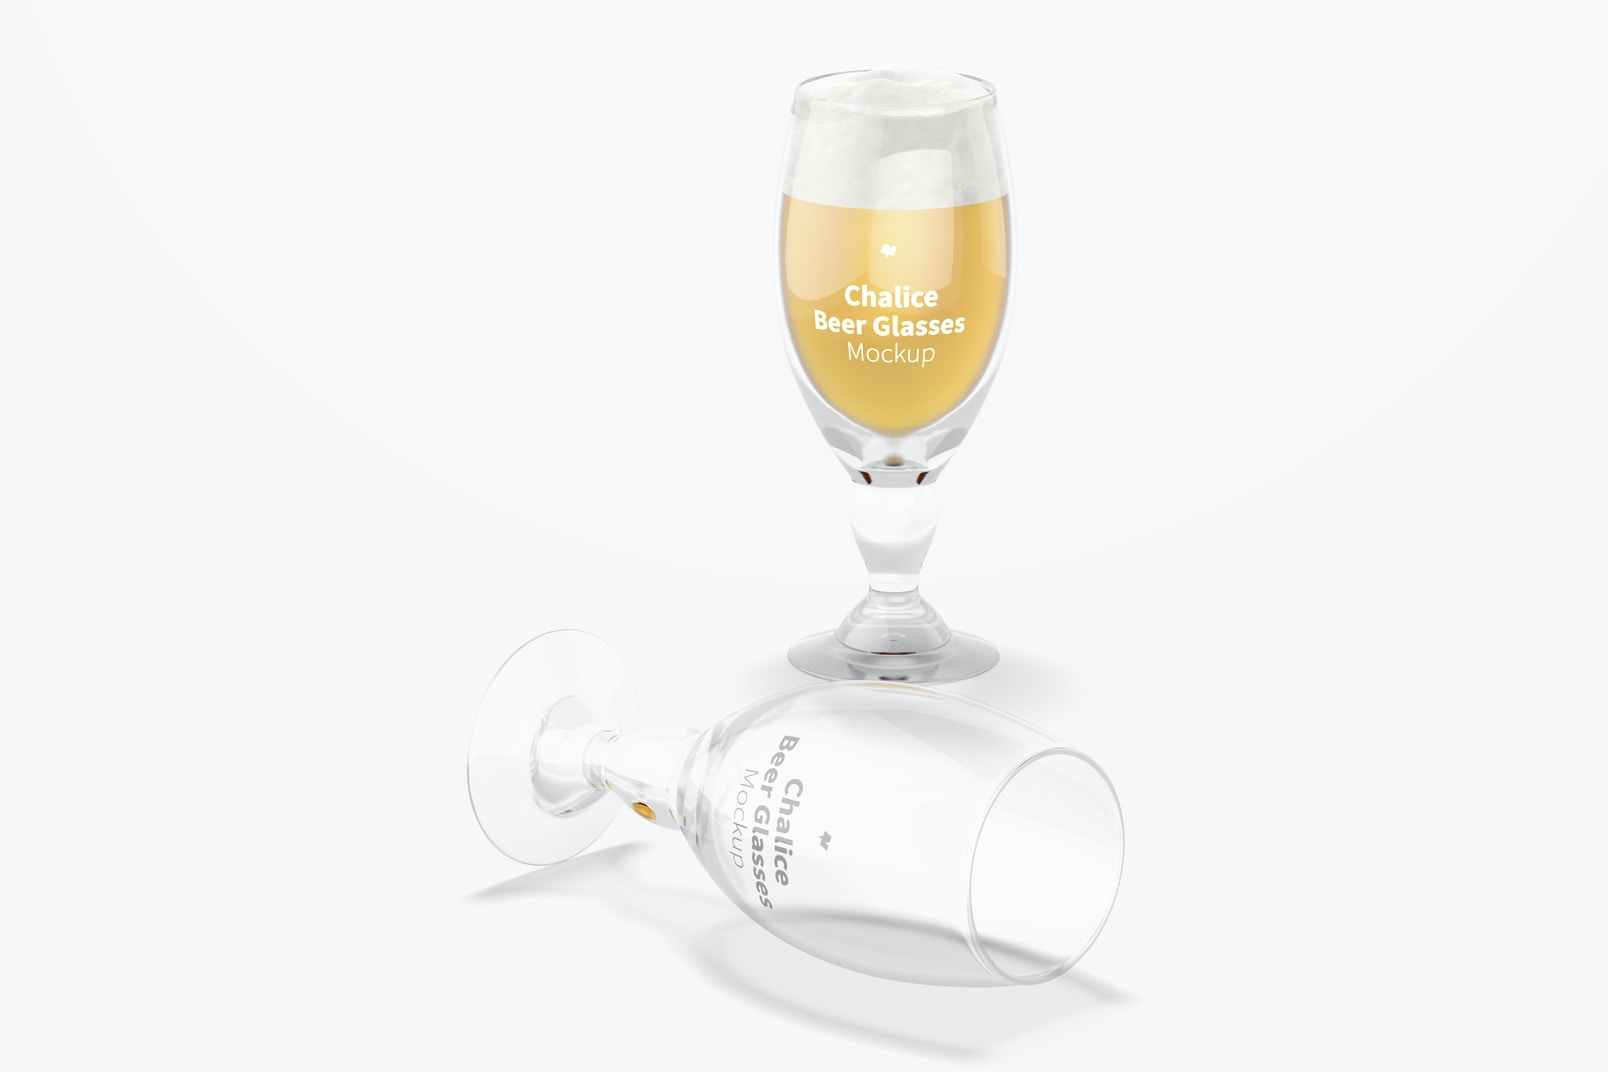 Chalice Beer Glass Mockup